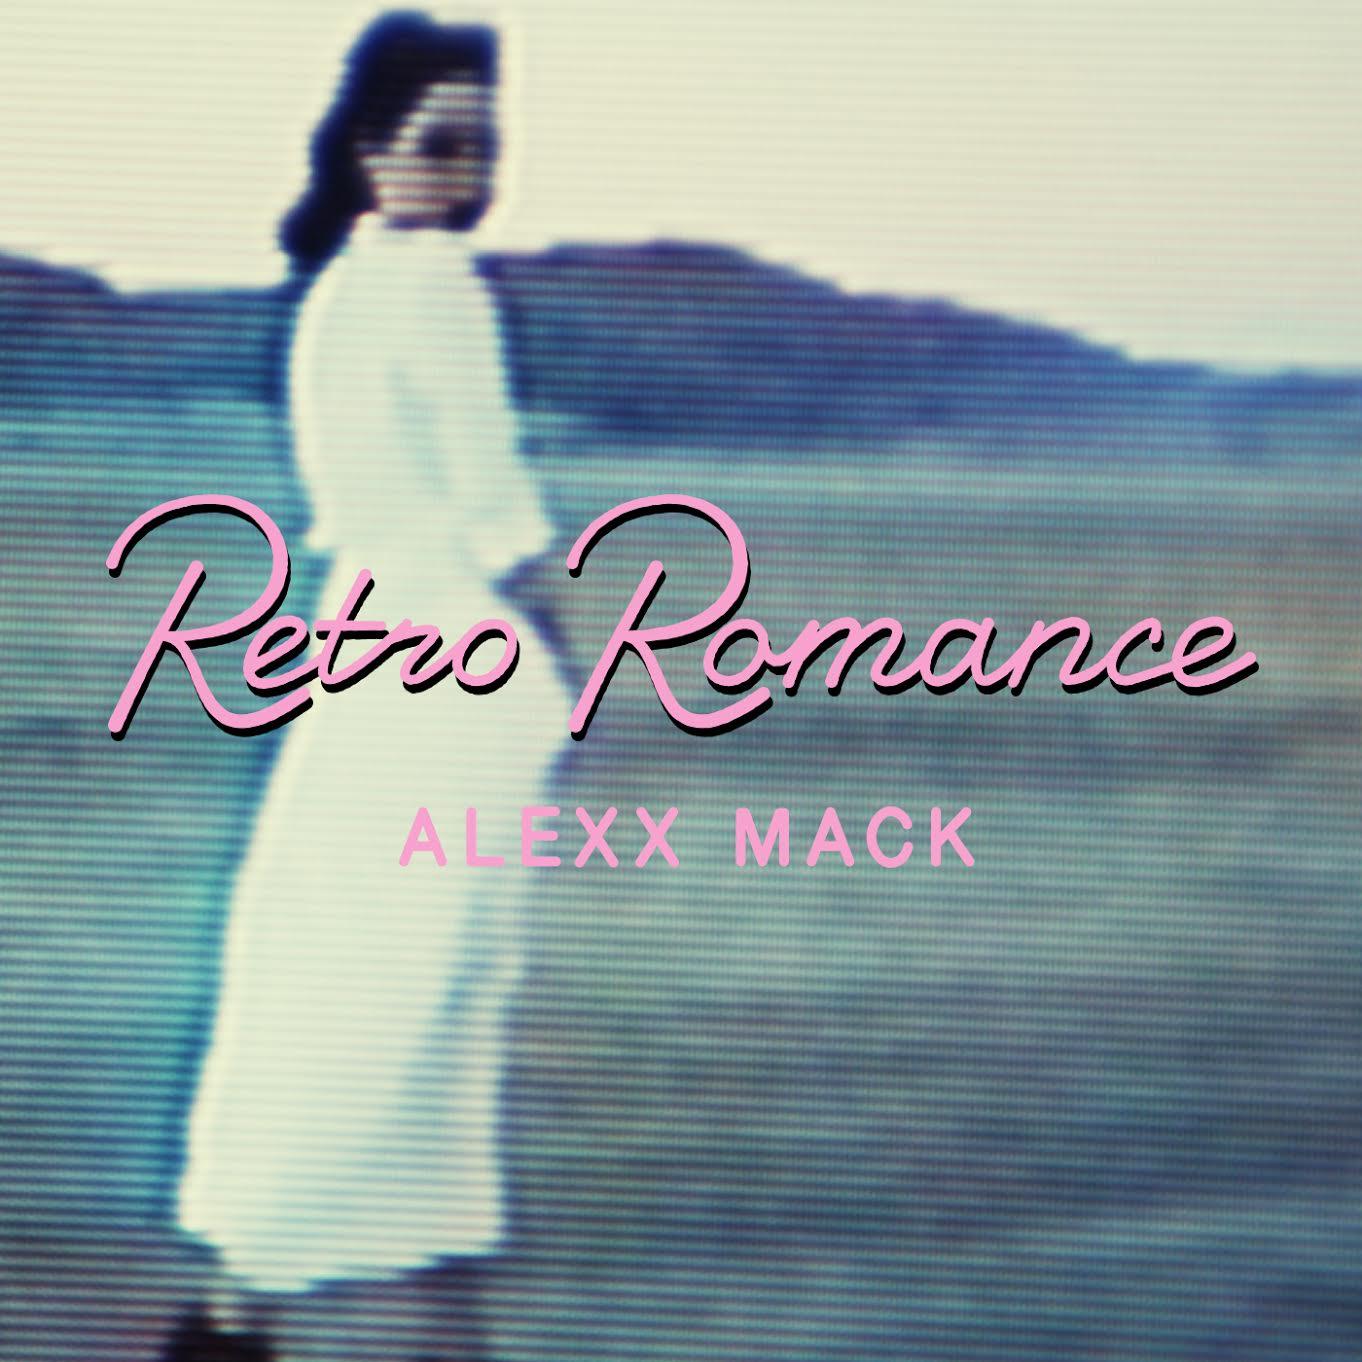 RetroRomance